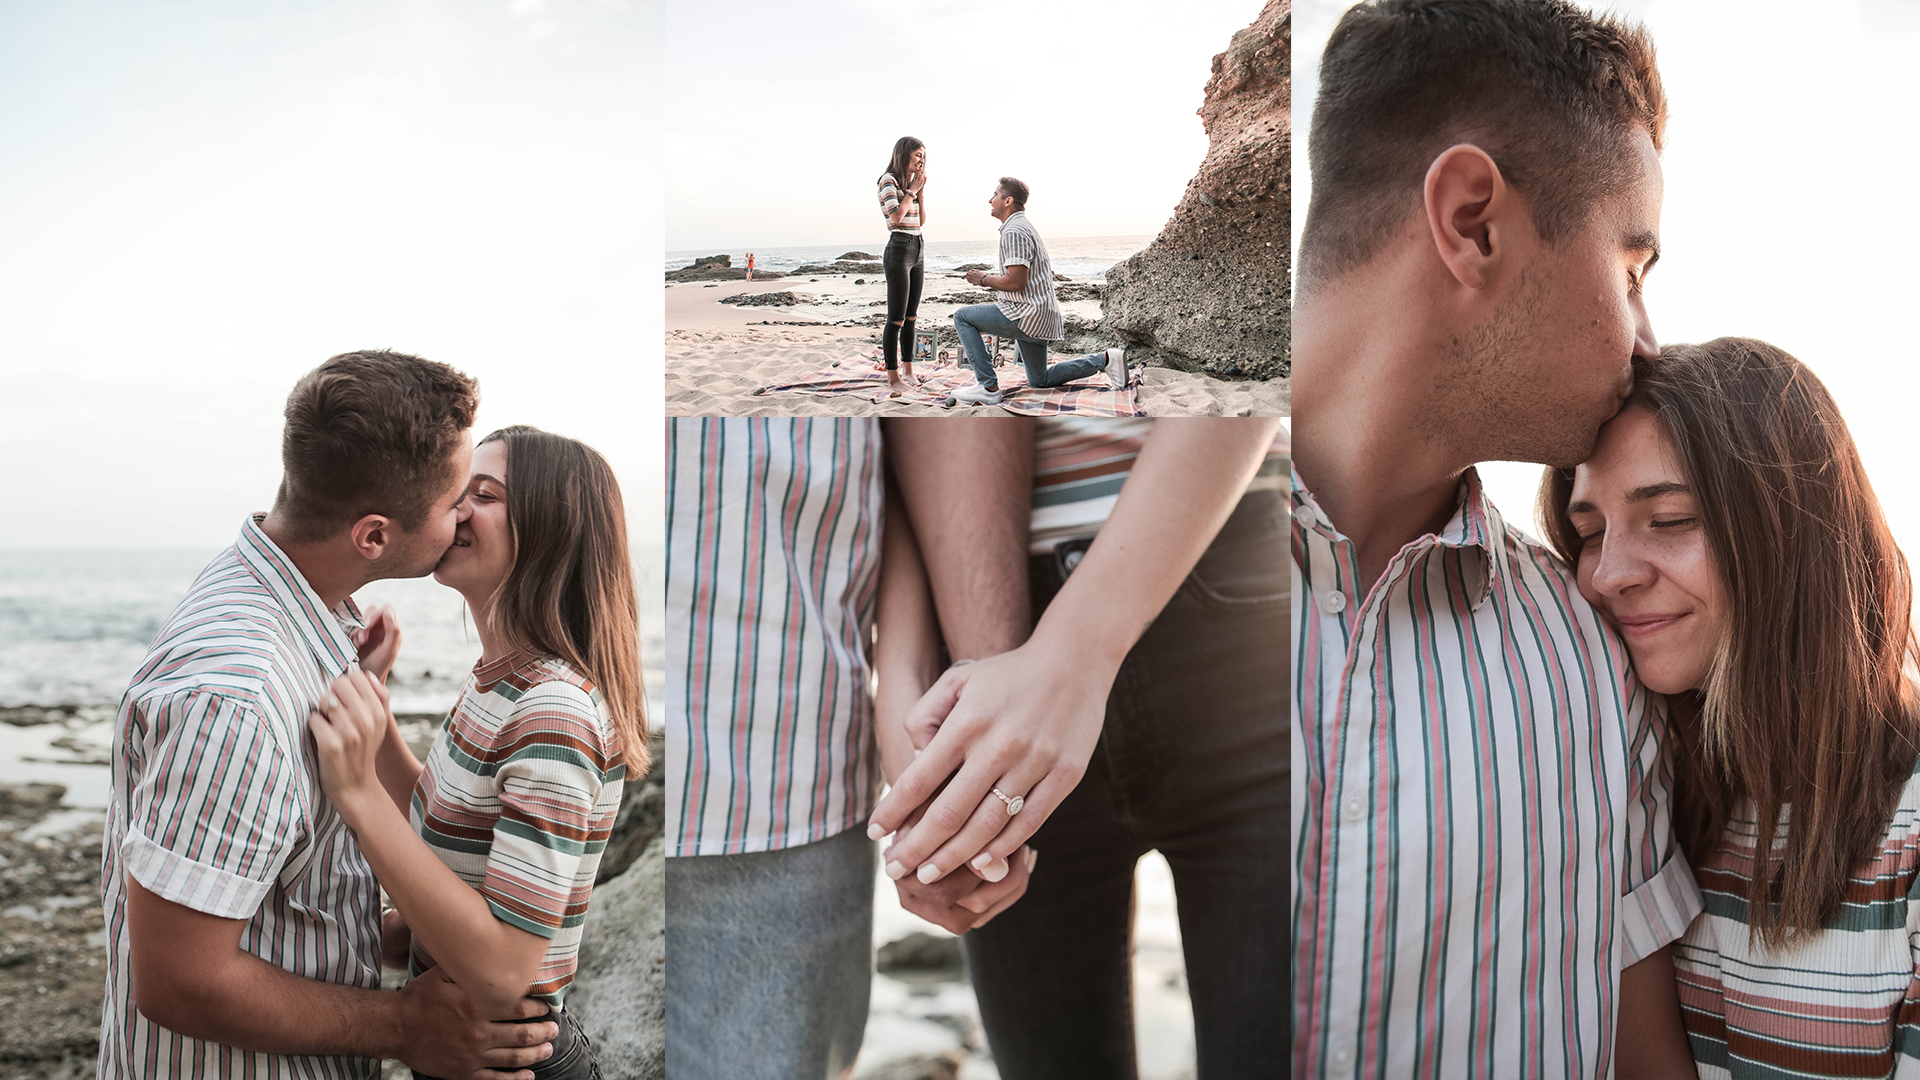 Noah & Tara - Engaged | August 24, 2018